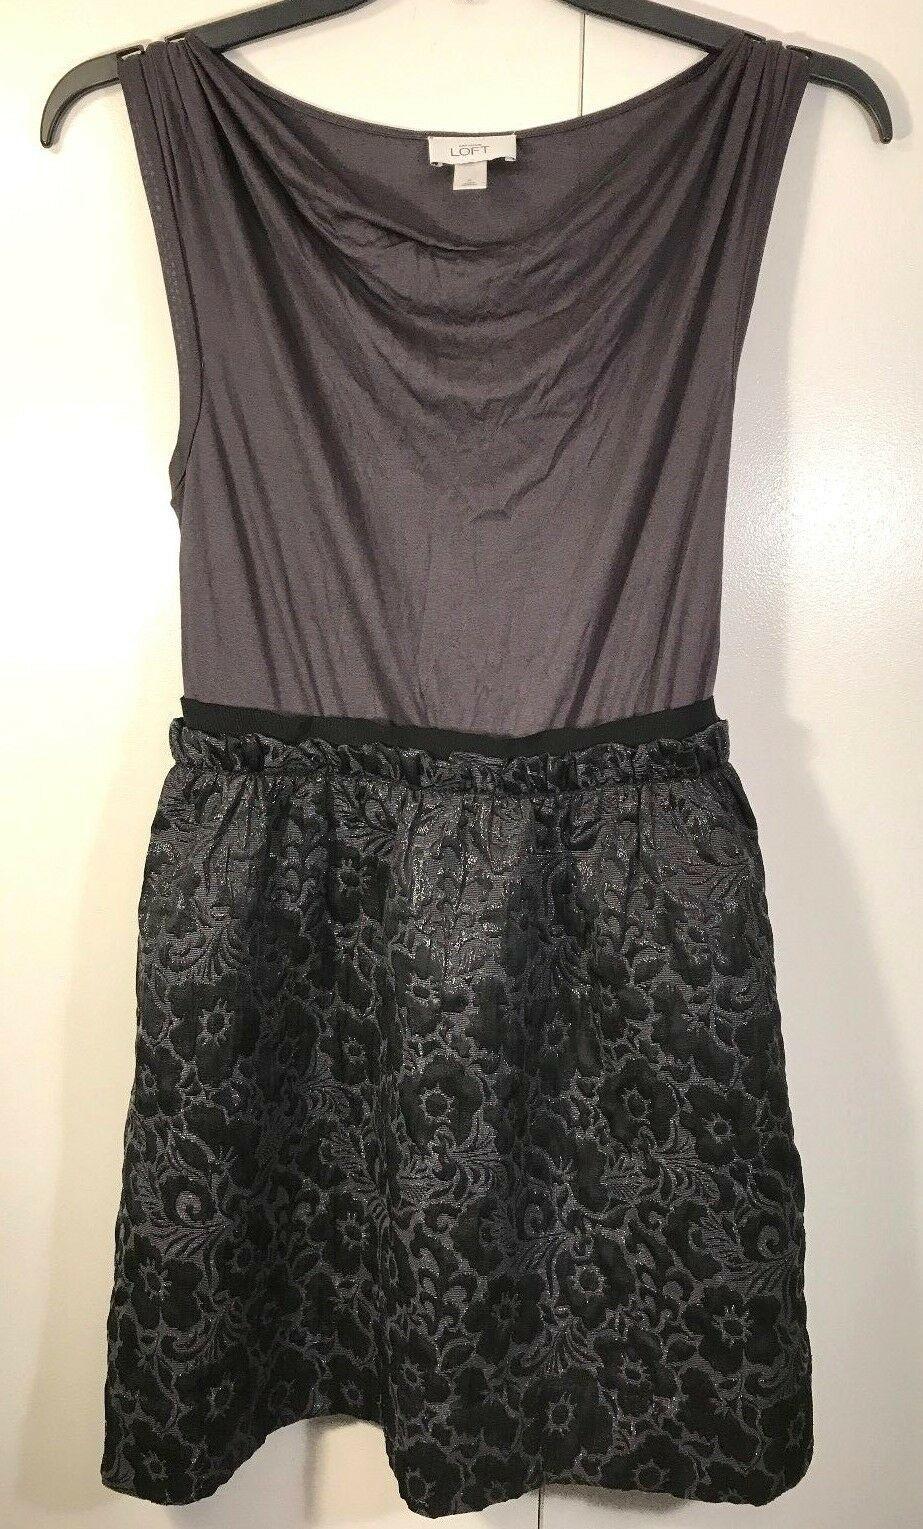 Ann Taylor Loft Gray Sparkle Black Shirt/Skirt Blouson Sleeveless Cowl Dress 4